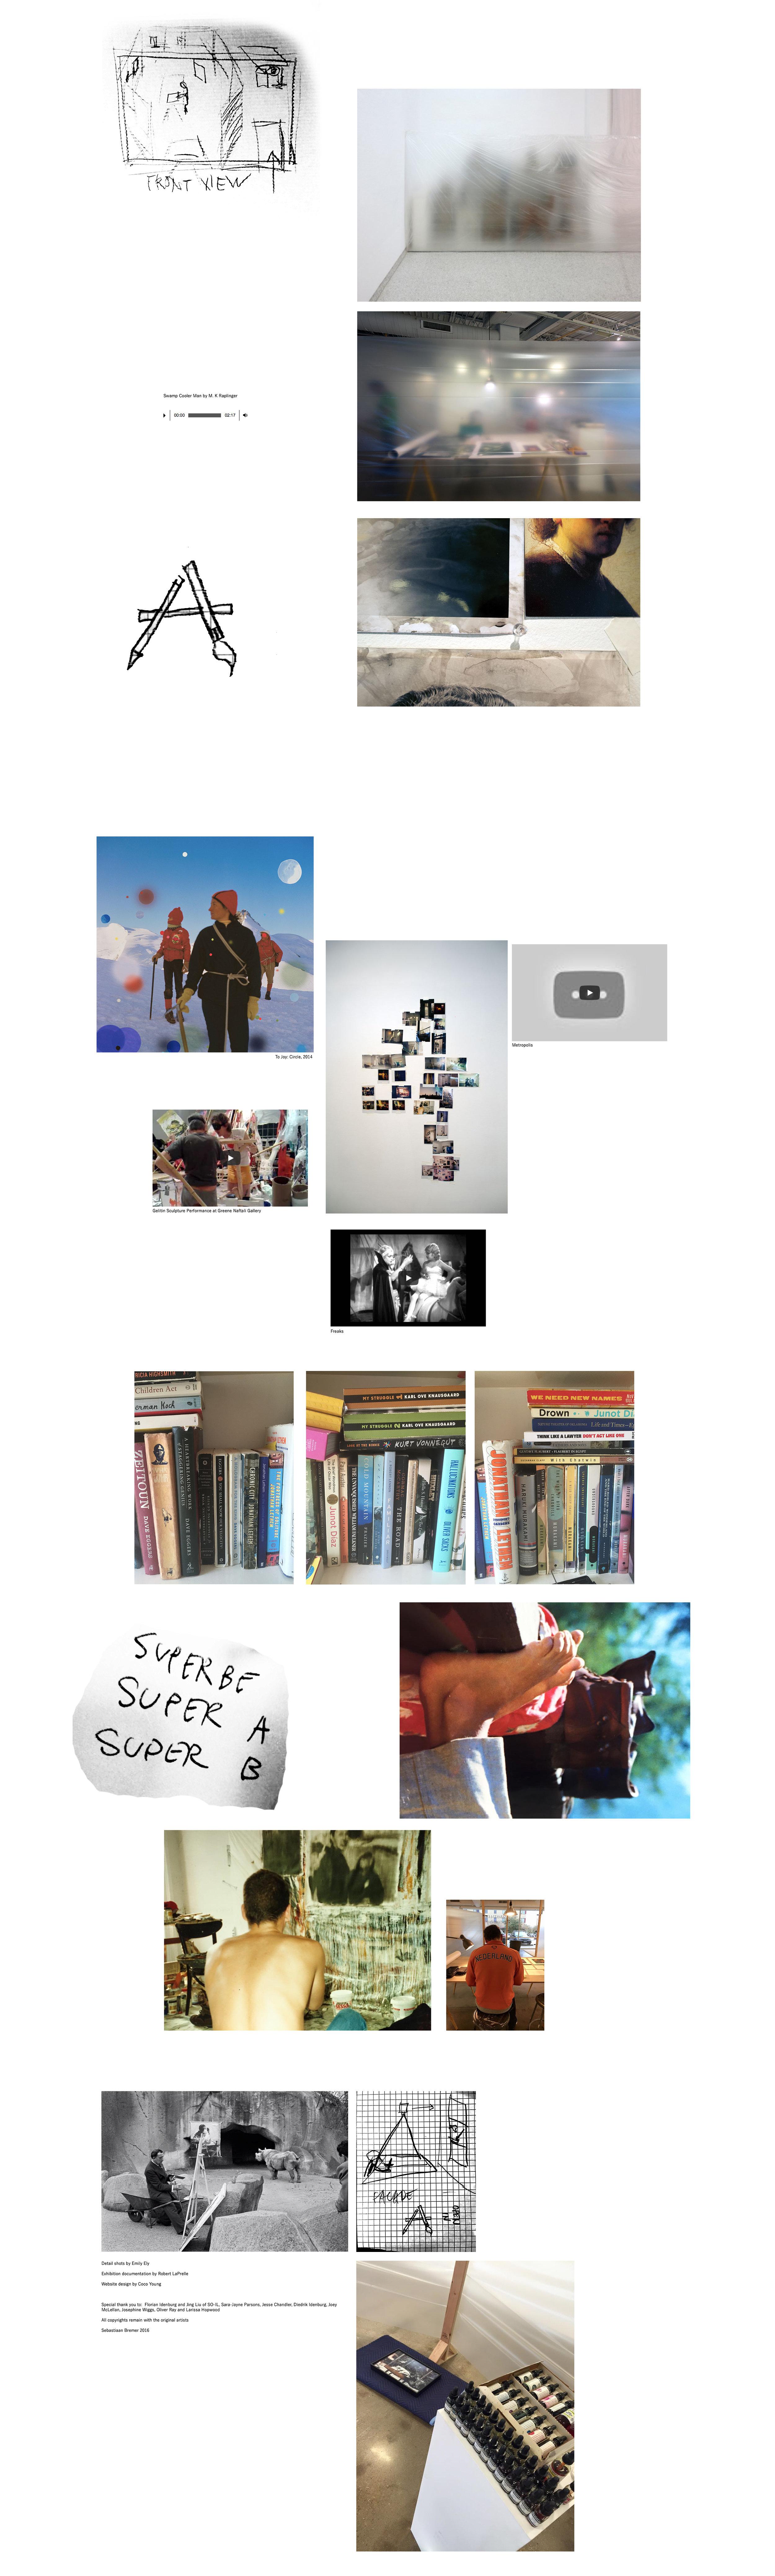 recordingstudioa_website_documentation_final_7.jpg